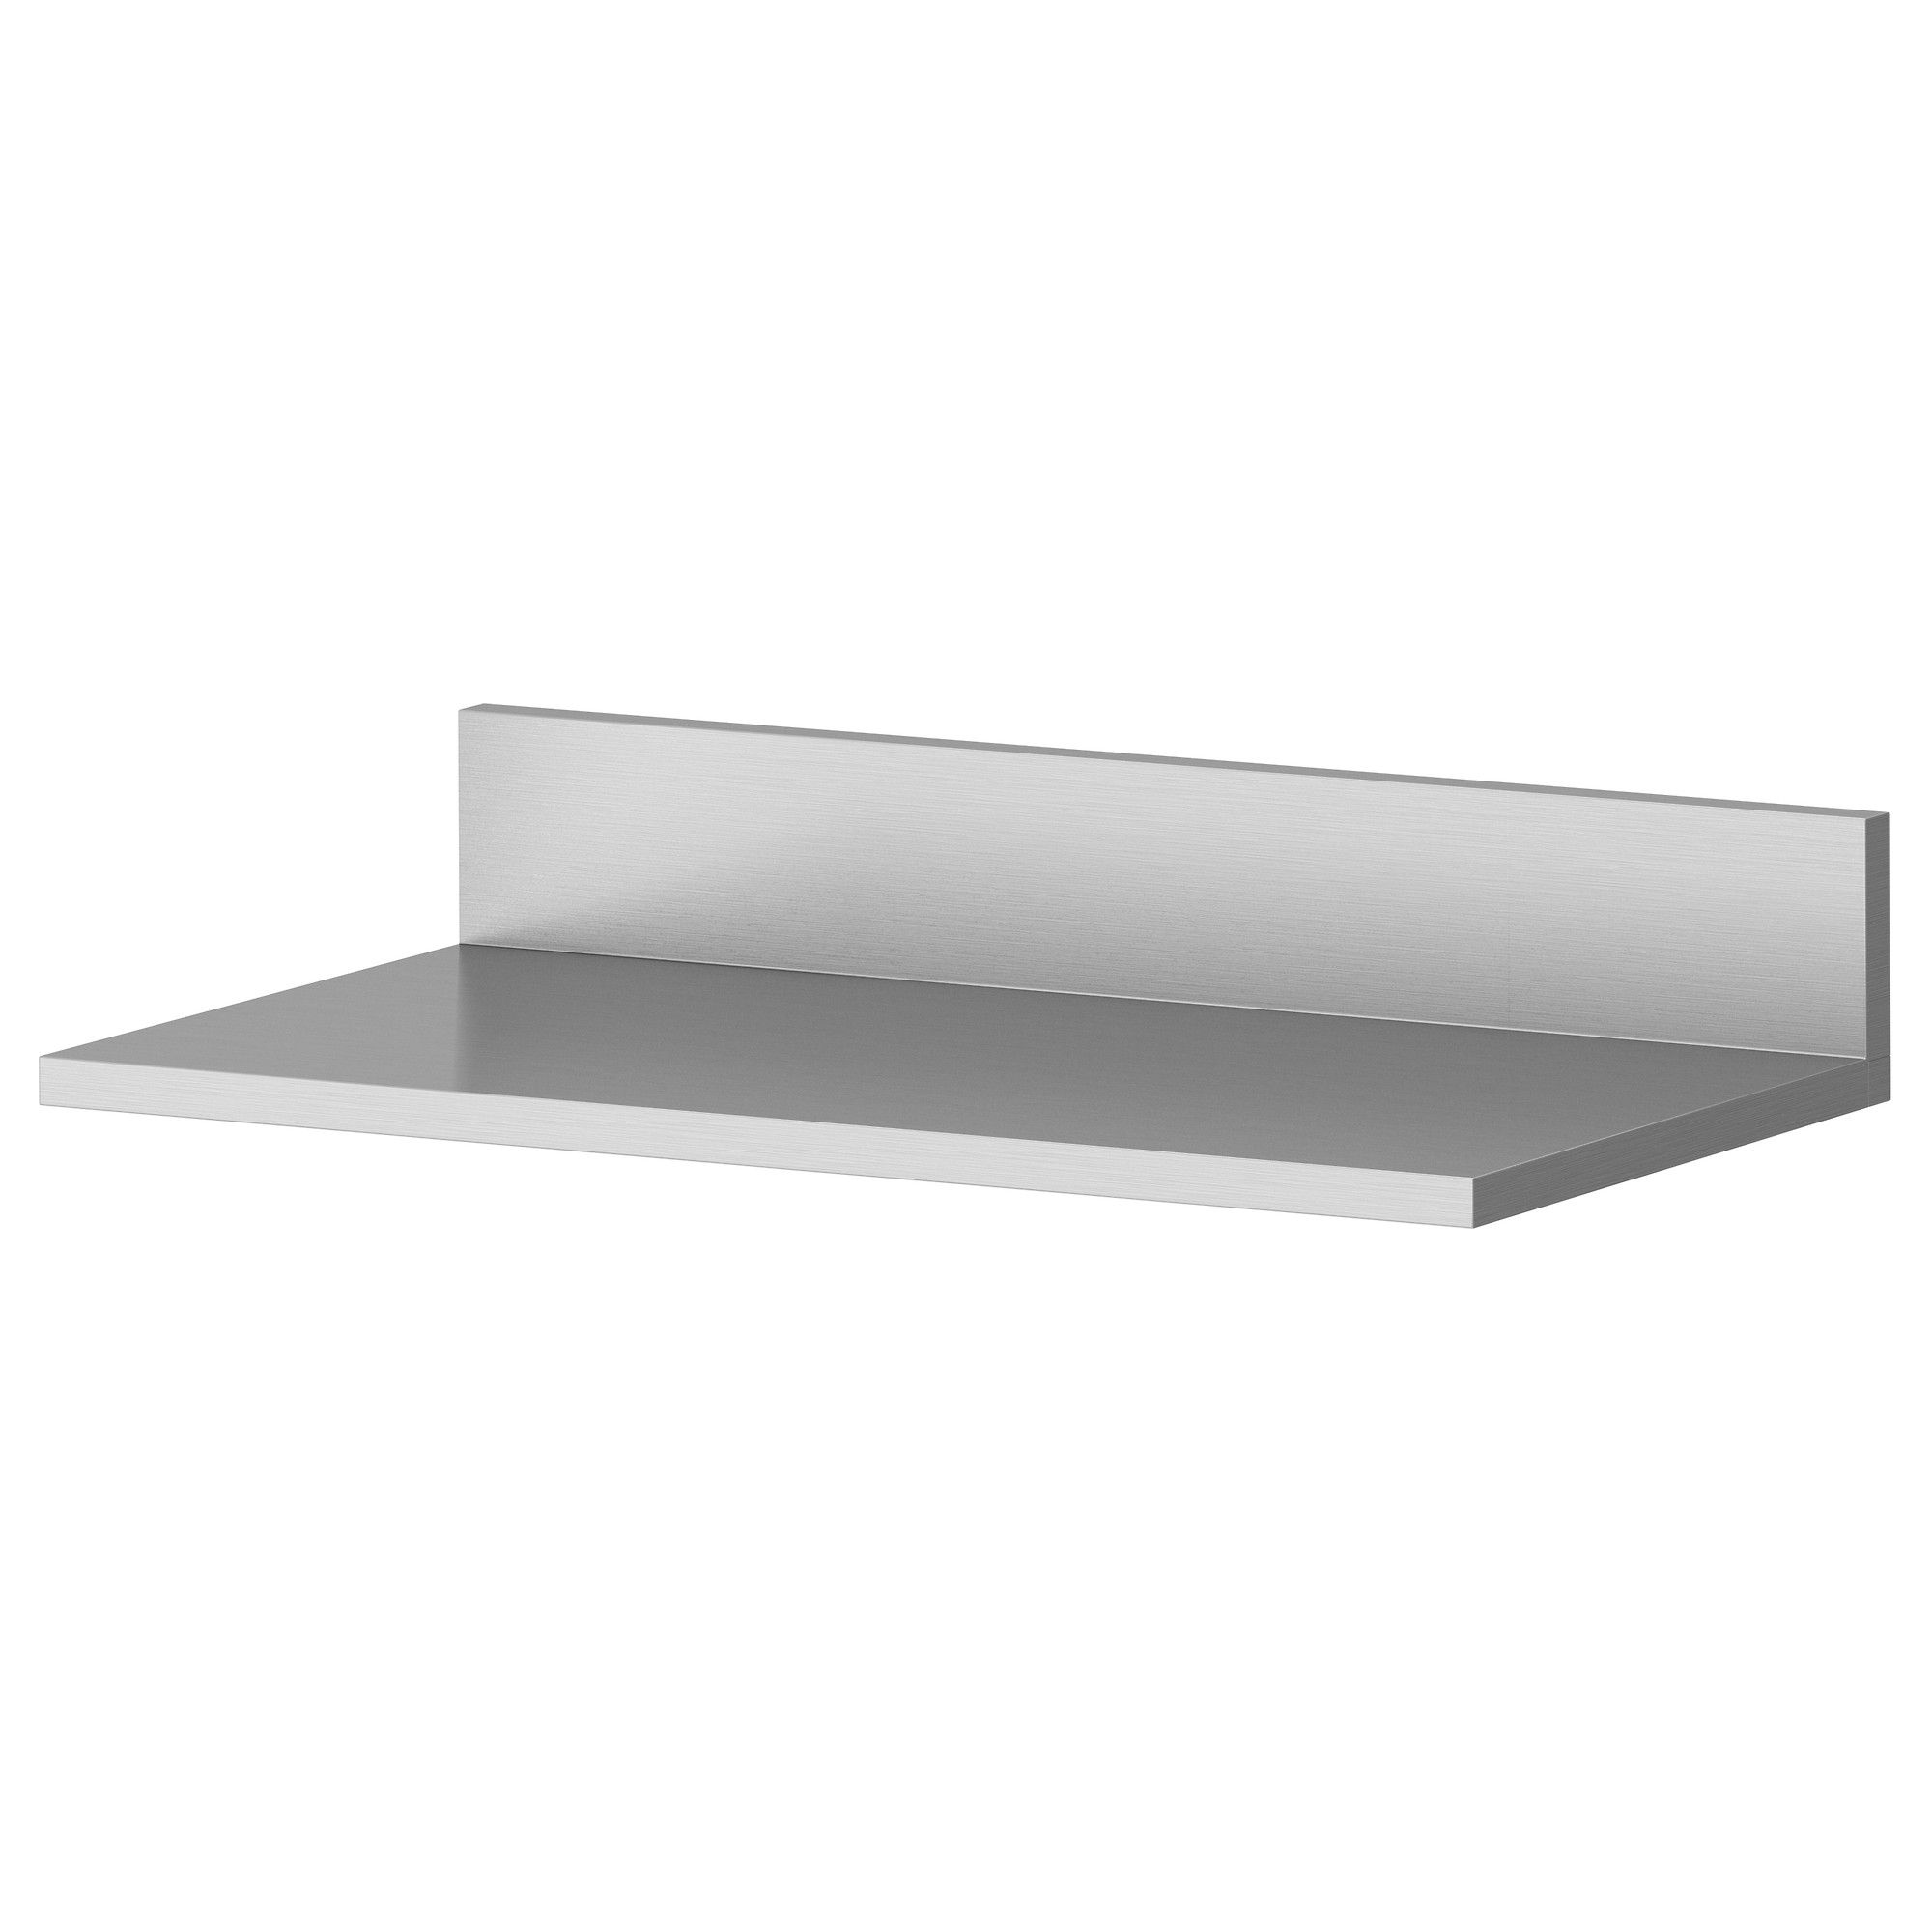 Ikea Stainless Steel Wall Shelf, Kitchen Spice Rack Storage Organizer  Limhamn, X (Pack of